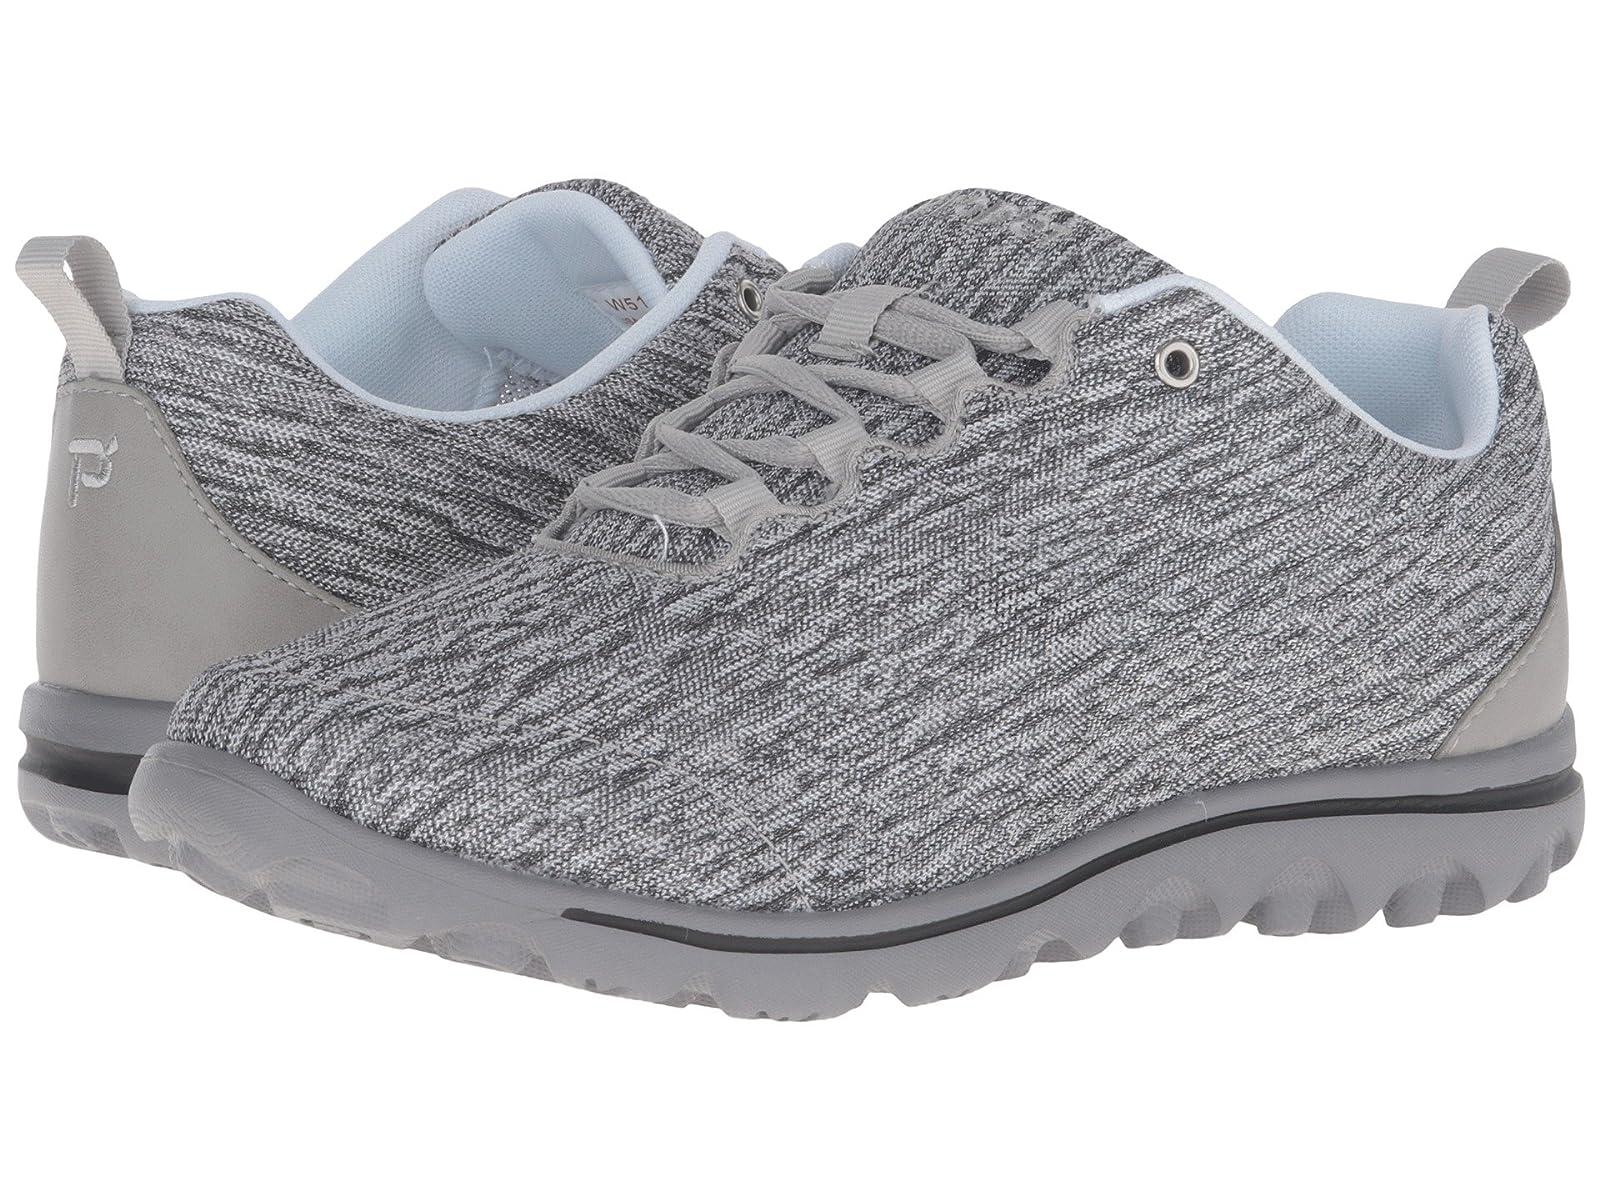 Propet TravelActivAtmospheric grades have affordable shoes